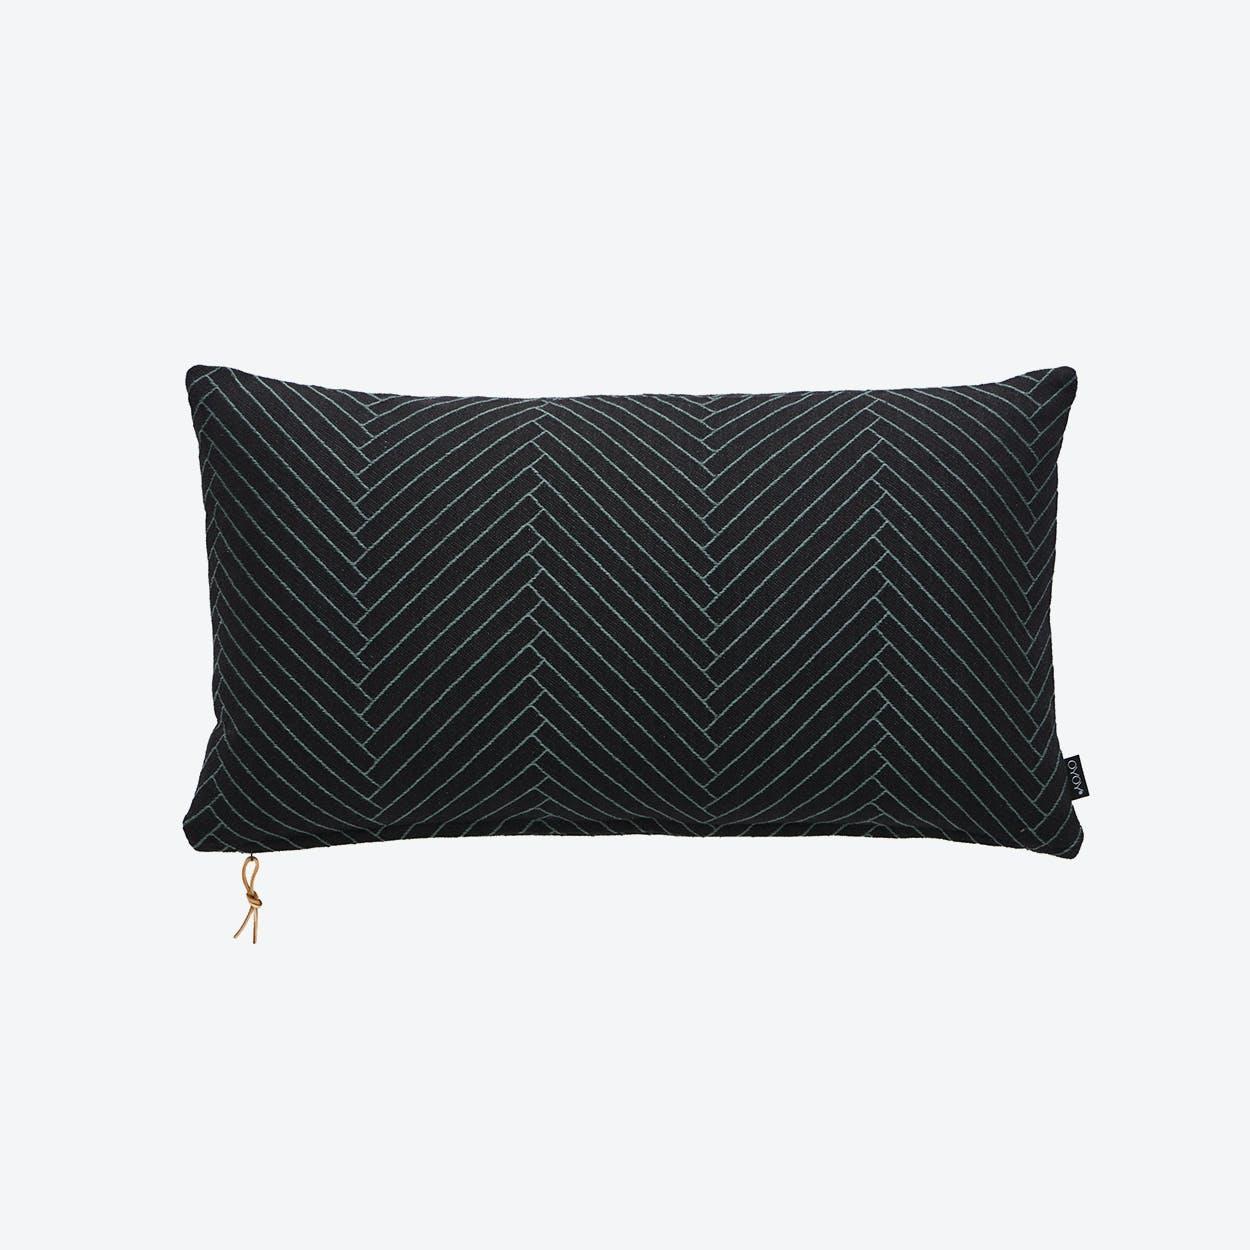 Fluffy Herringbone in Black 40X70Cm